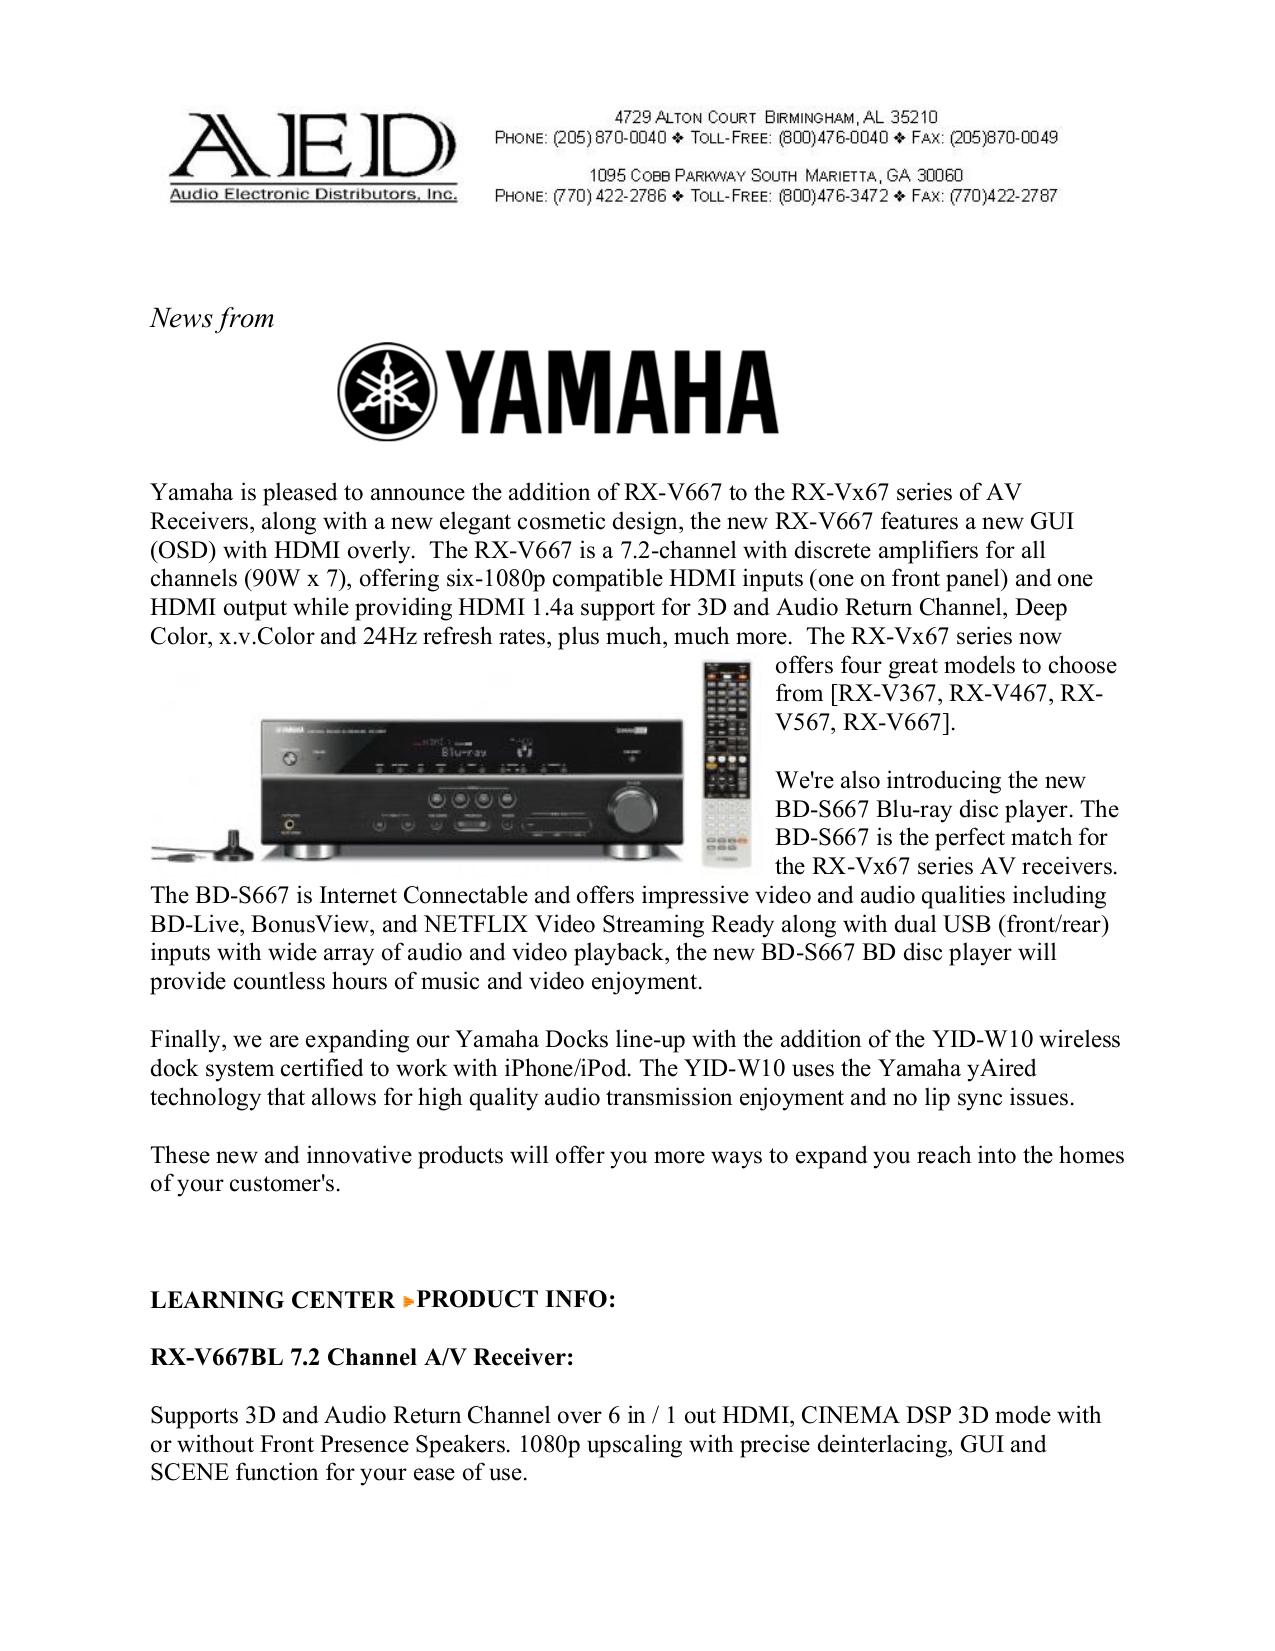 download free pdf for yamaha rx-v467 receiver manual